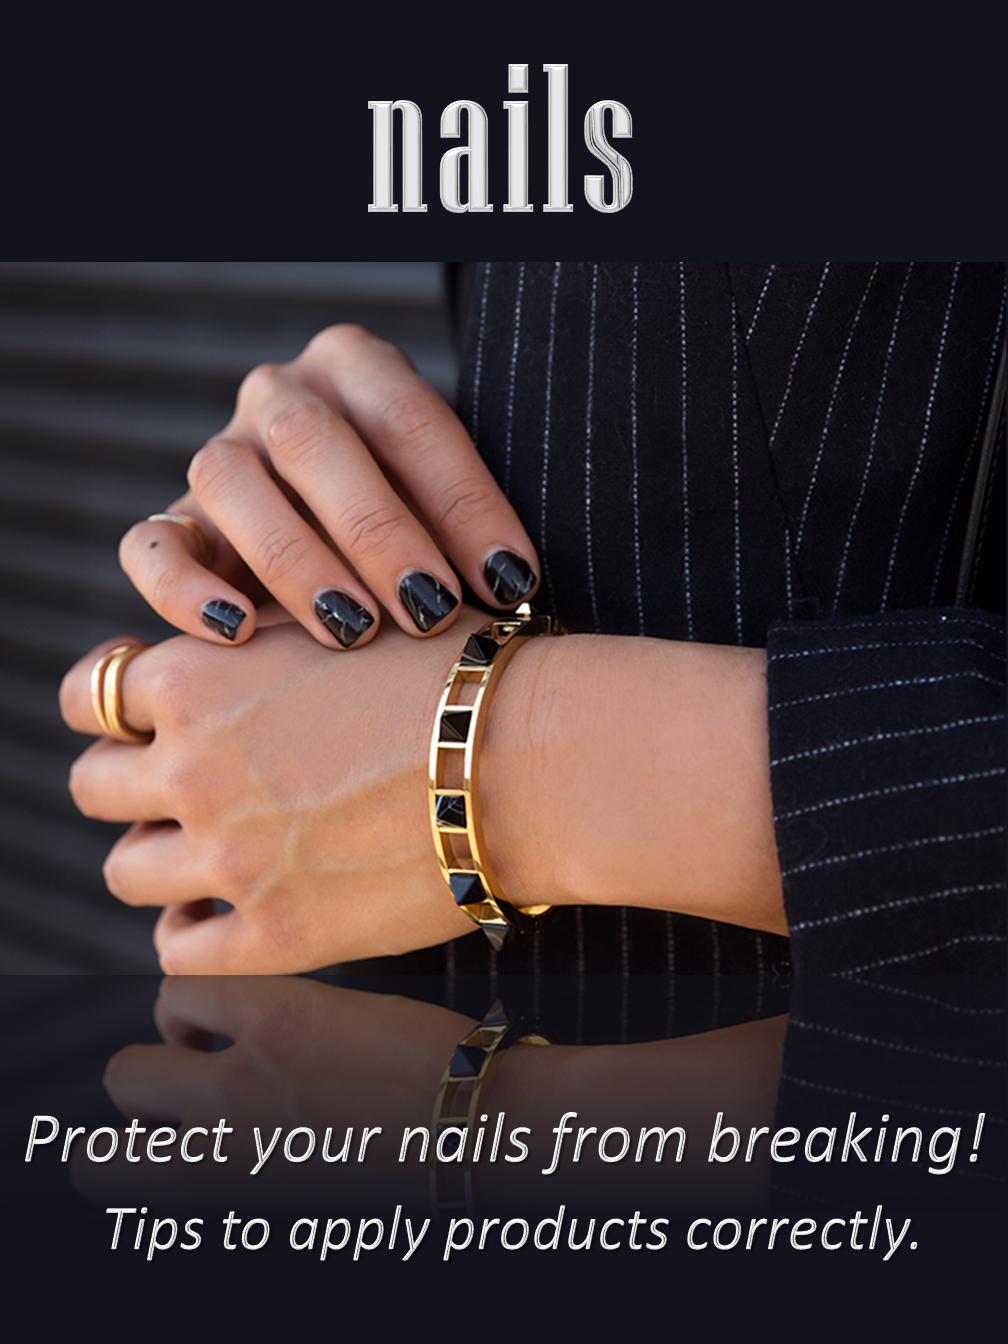 Nails Protection